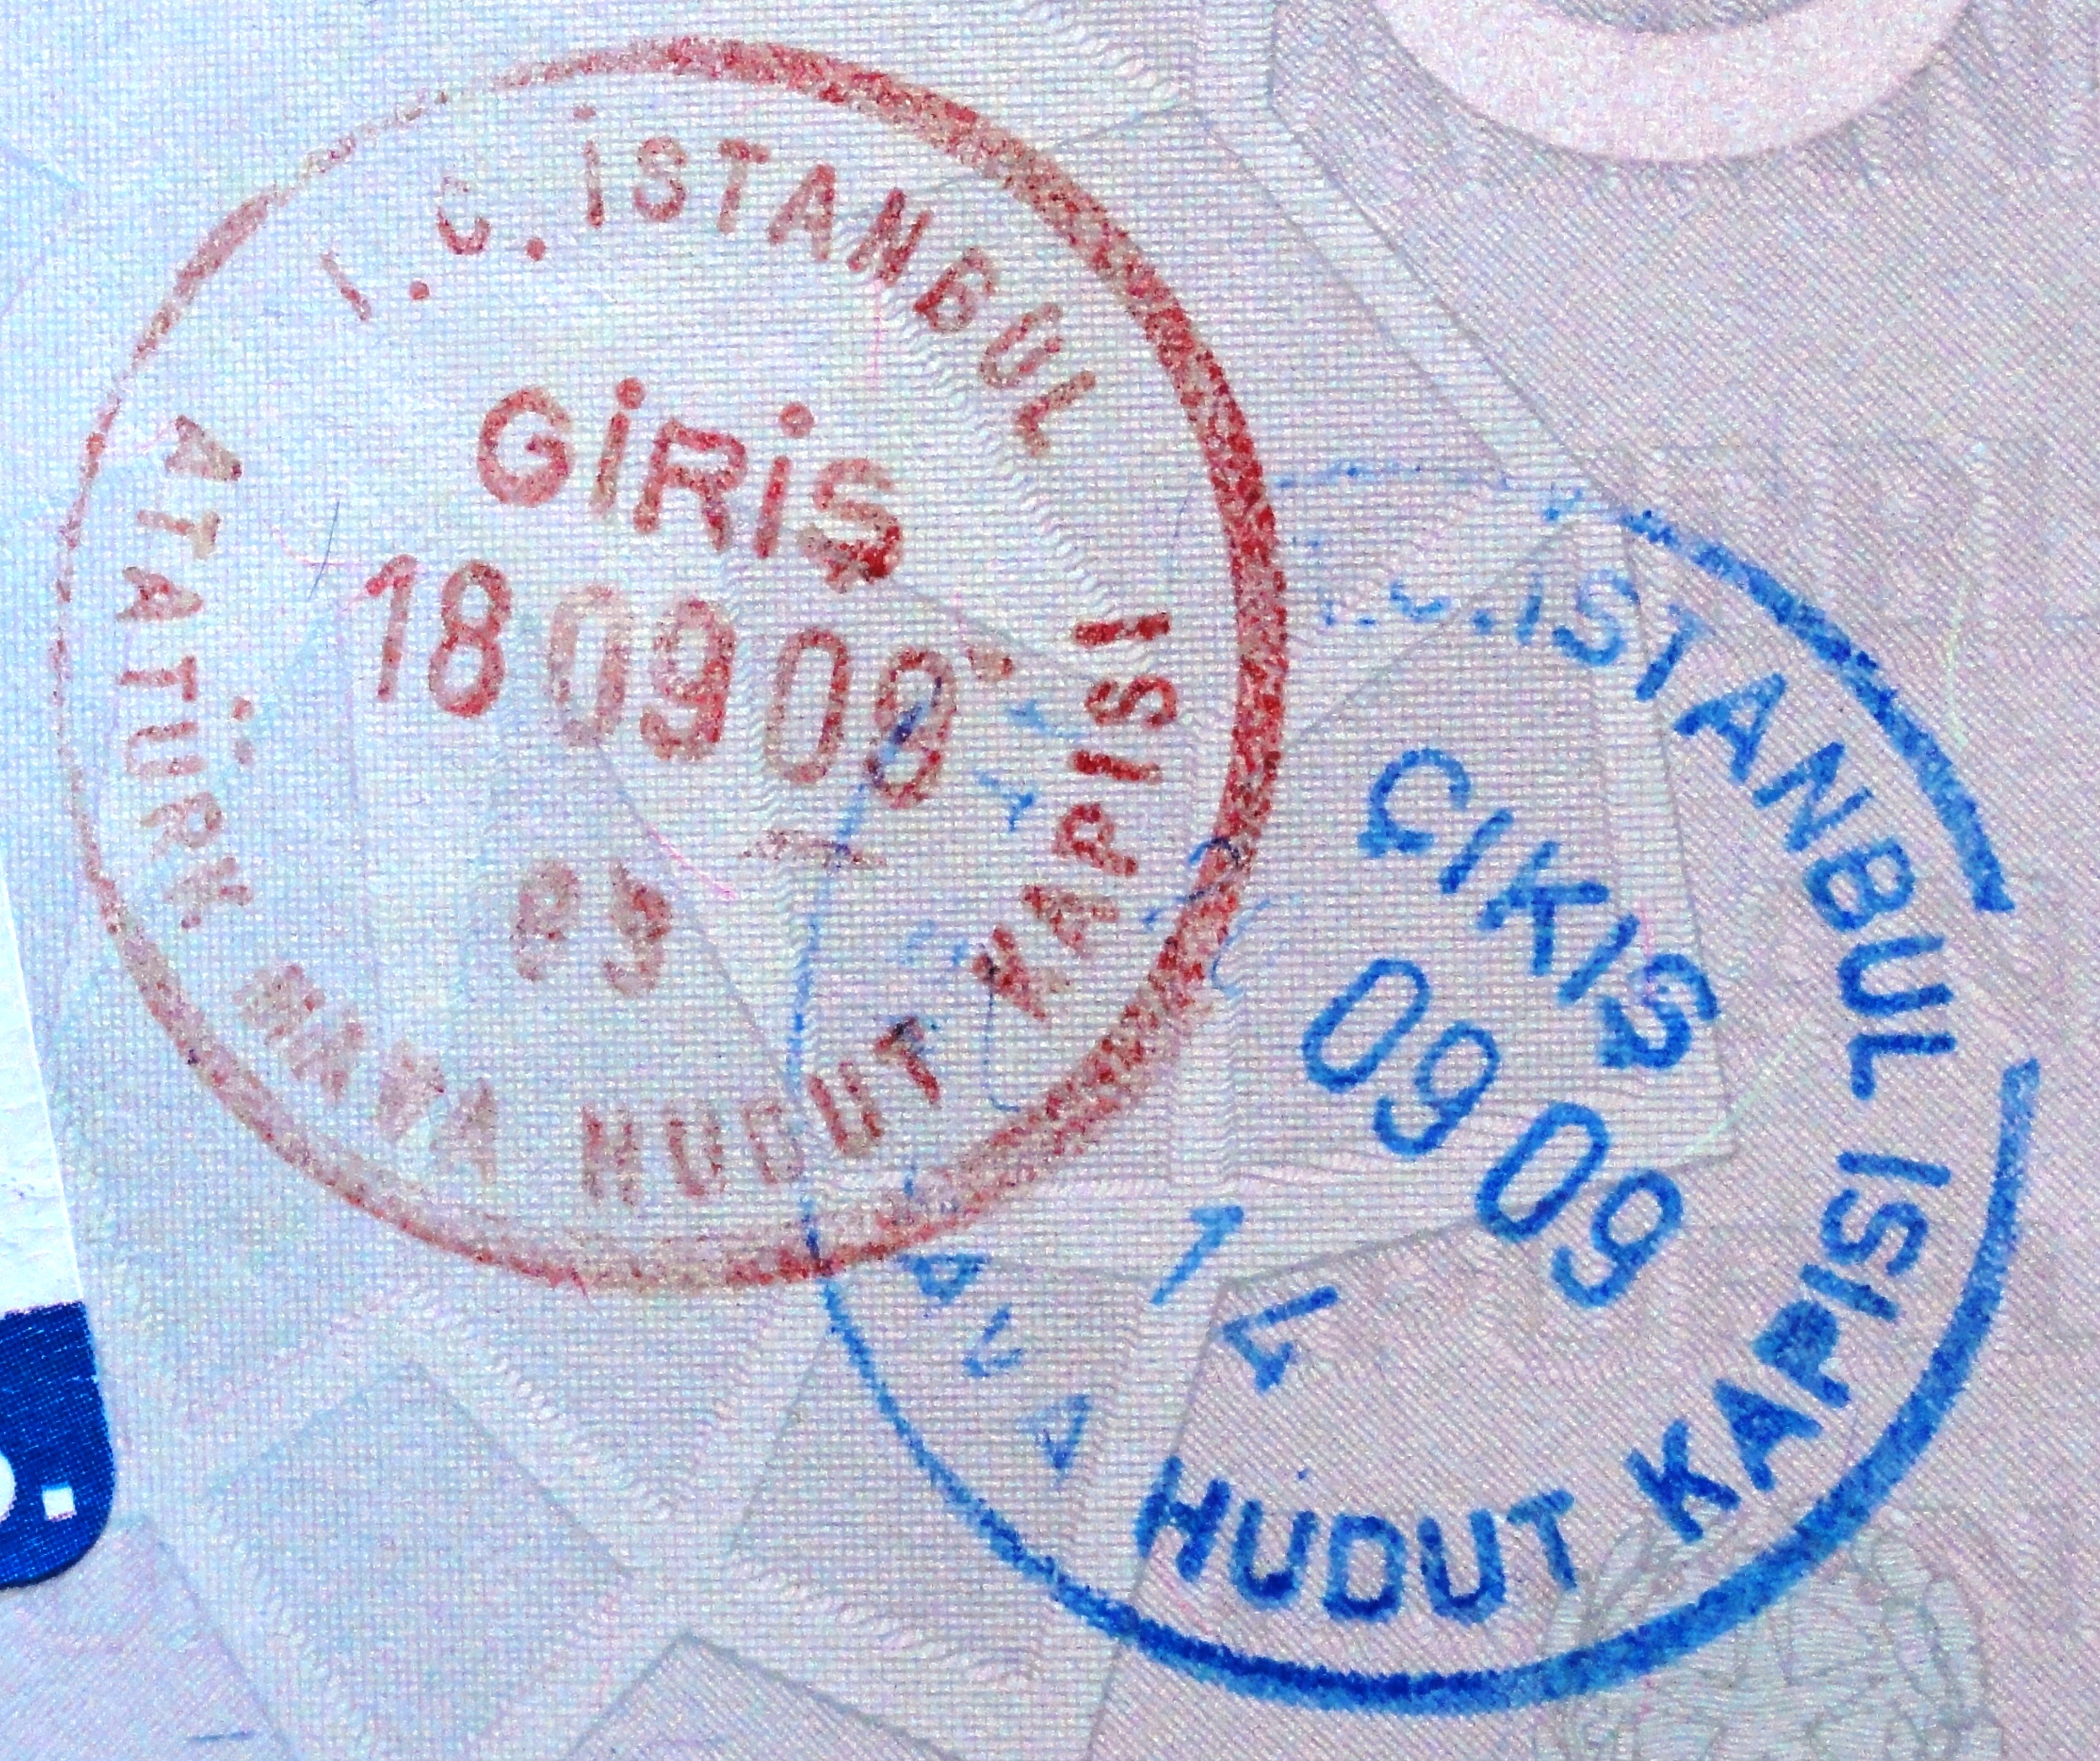 File:Turkey Visa Stamp.jpg - Wikimedia Commons